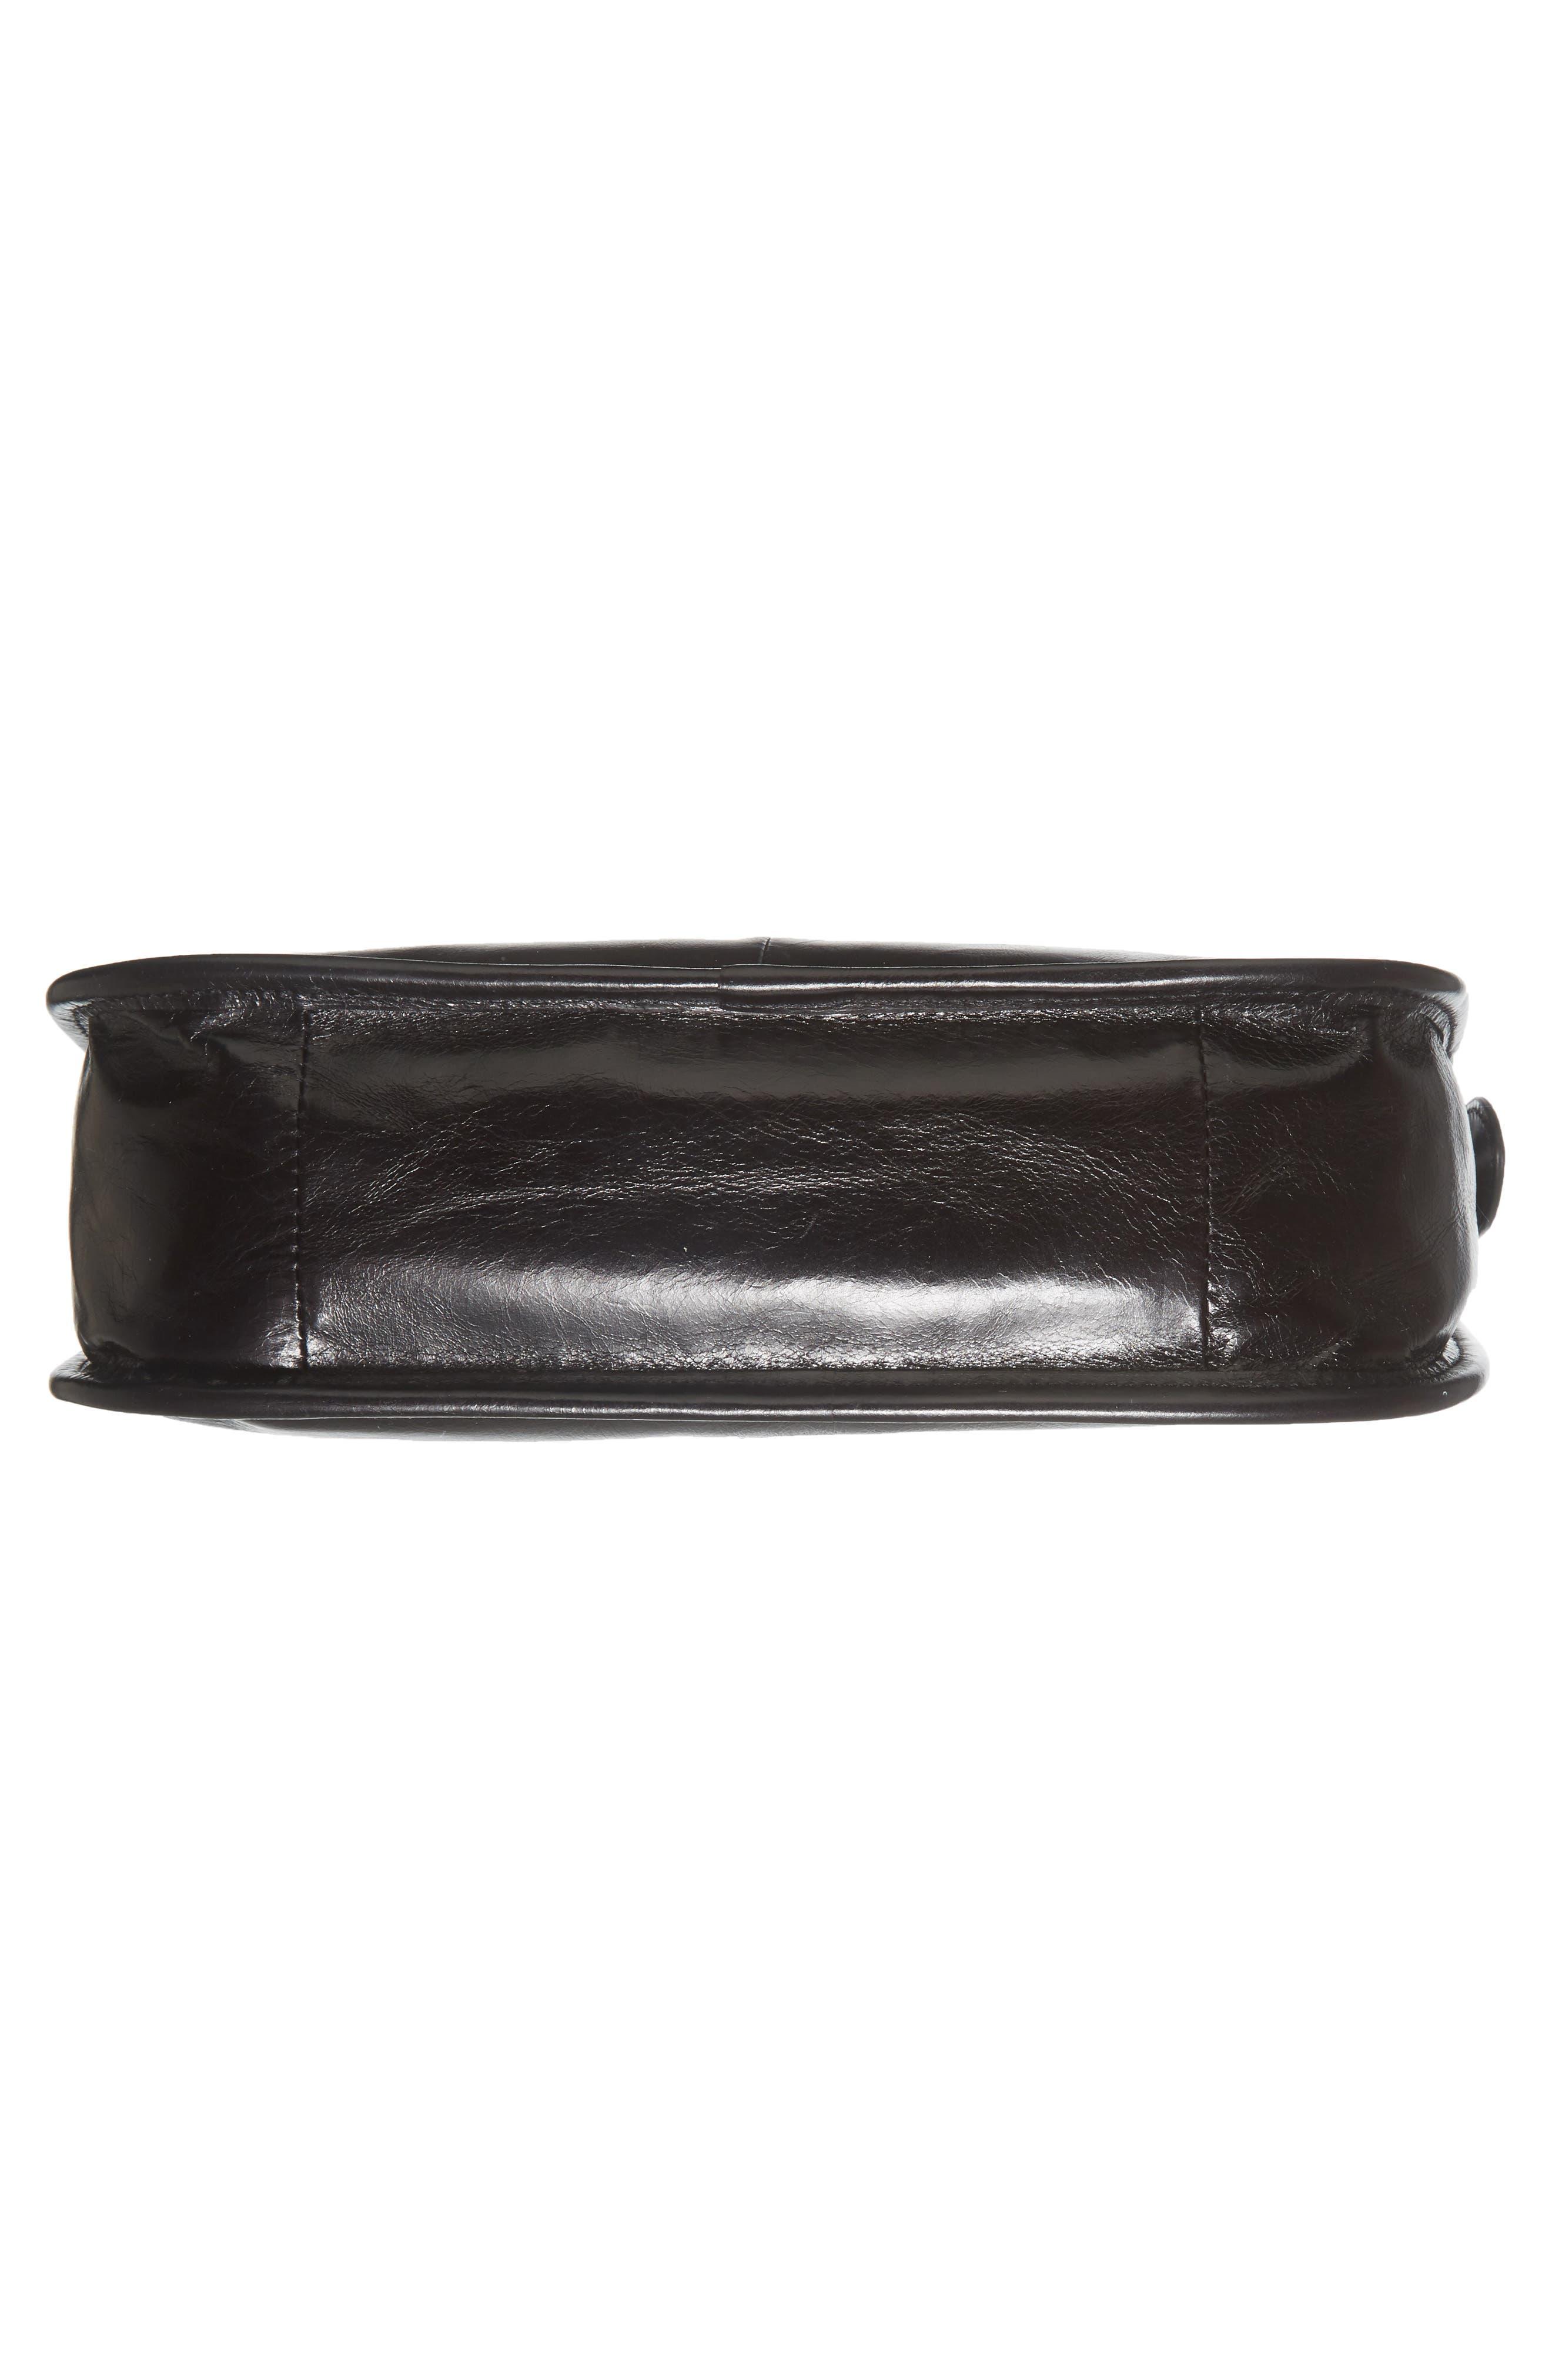 Chase Calfskin Leather Crossbody Bag,                             Alternate thumbnail 5, color,                             Black